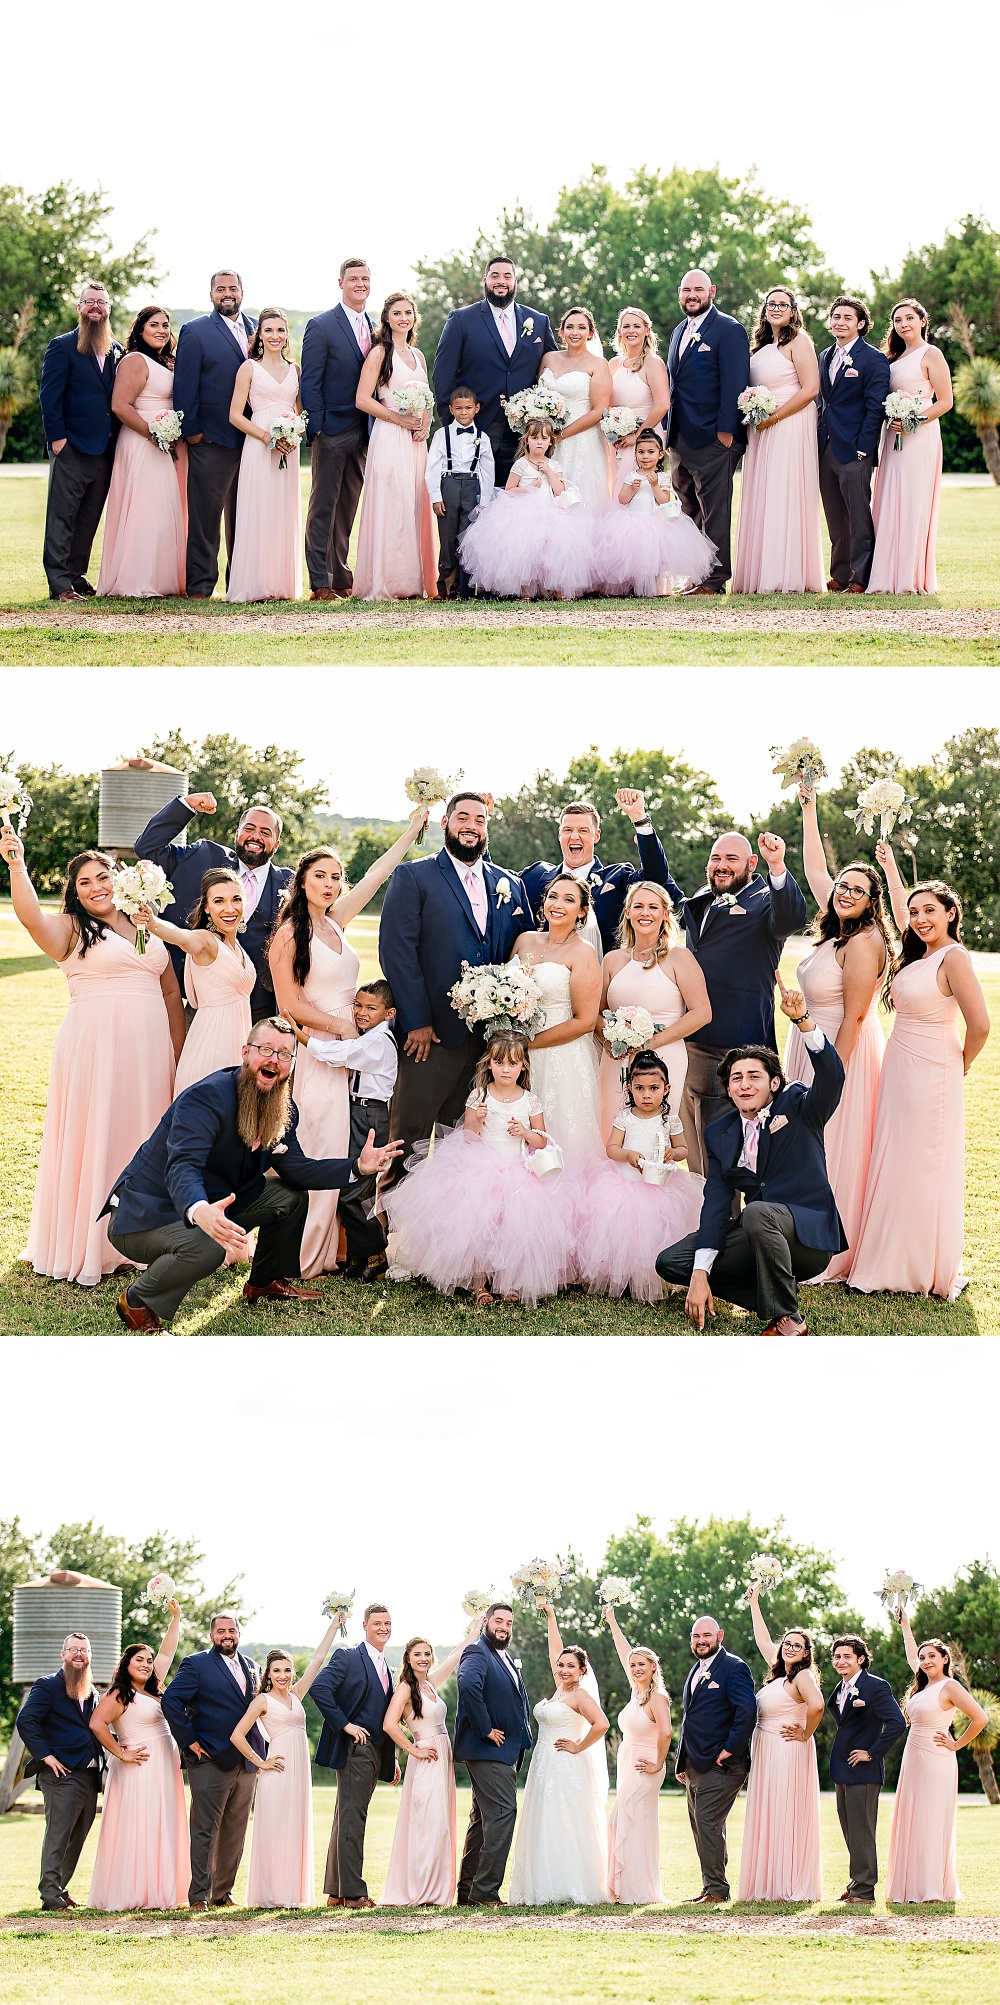 Wedding-Photographer-Bulverde-Texas-Western-Sky-Event-Venue-Carly-Barton-Photography_0033.jpg